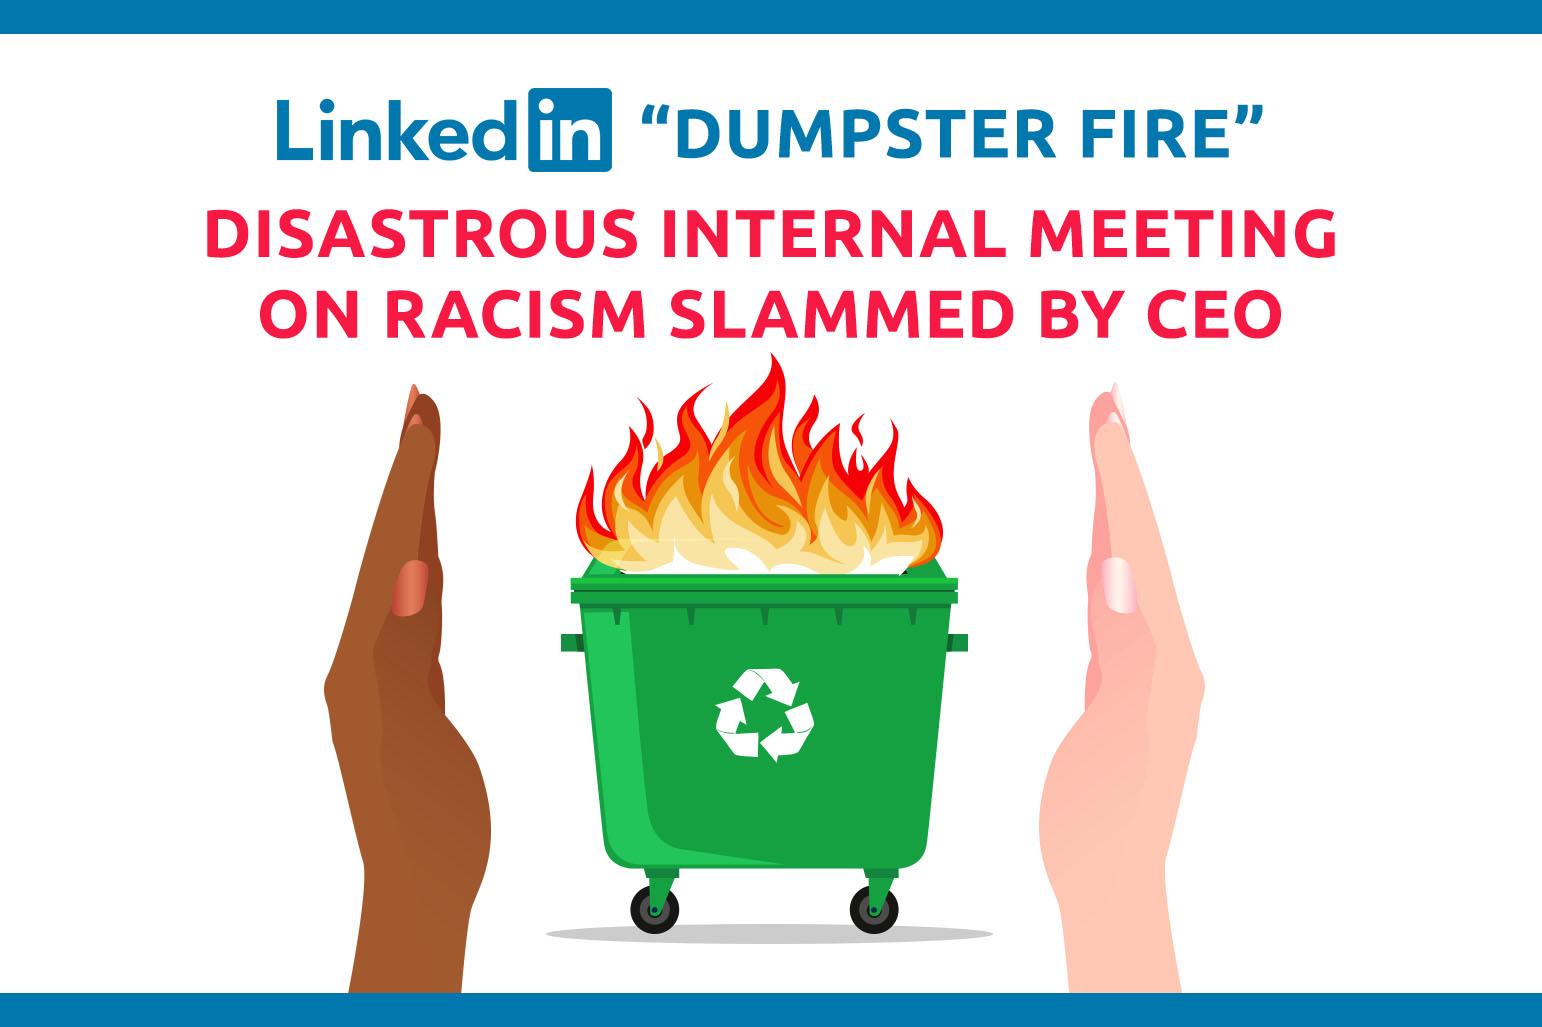 "LinkedIn ""垃圾箱之火""。CEO抨击关于种族主义的灾难性内部会议。"